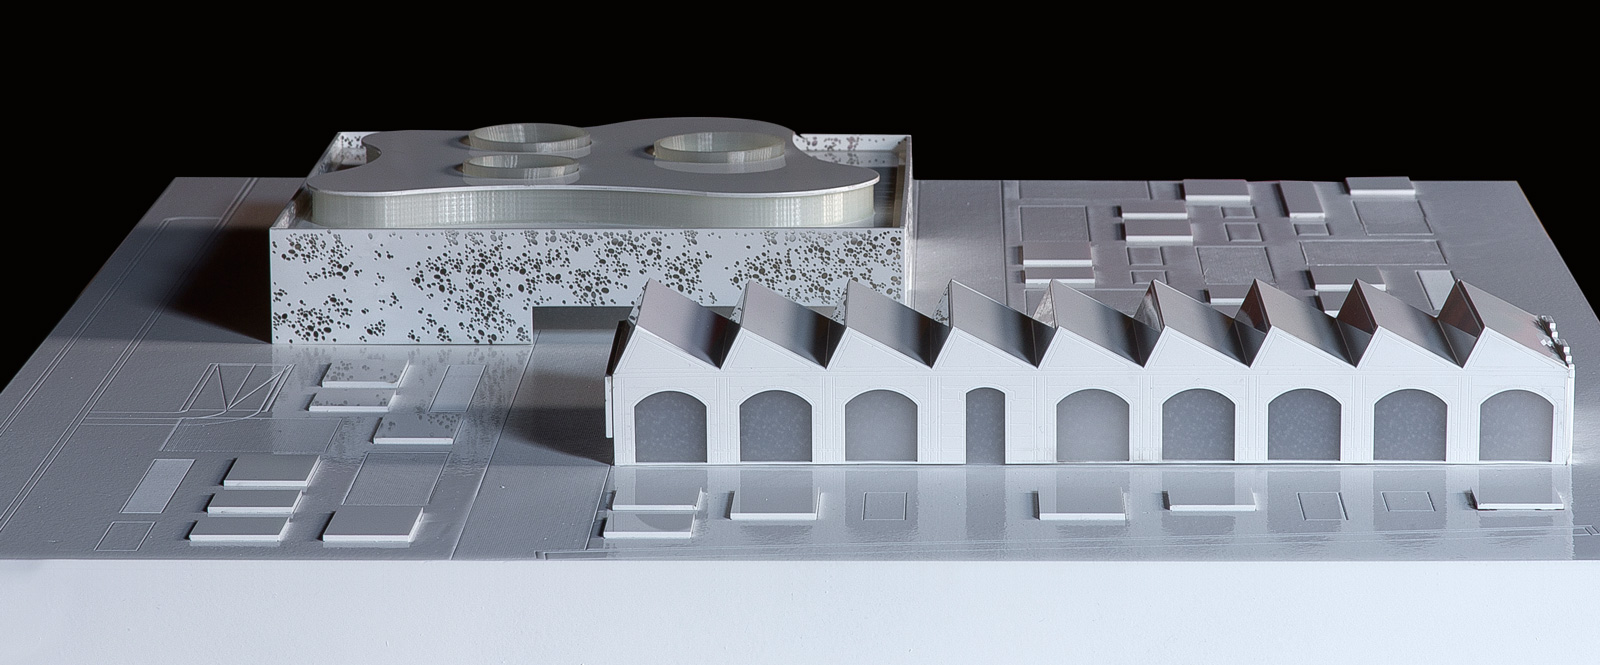 maqueta-arquitectura-concurso-valencia-iluminada-pfc-centro-musical-6